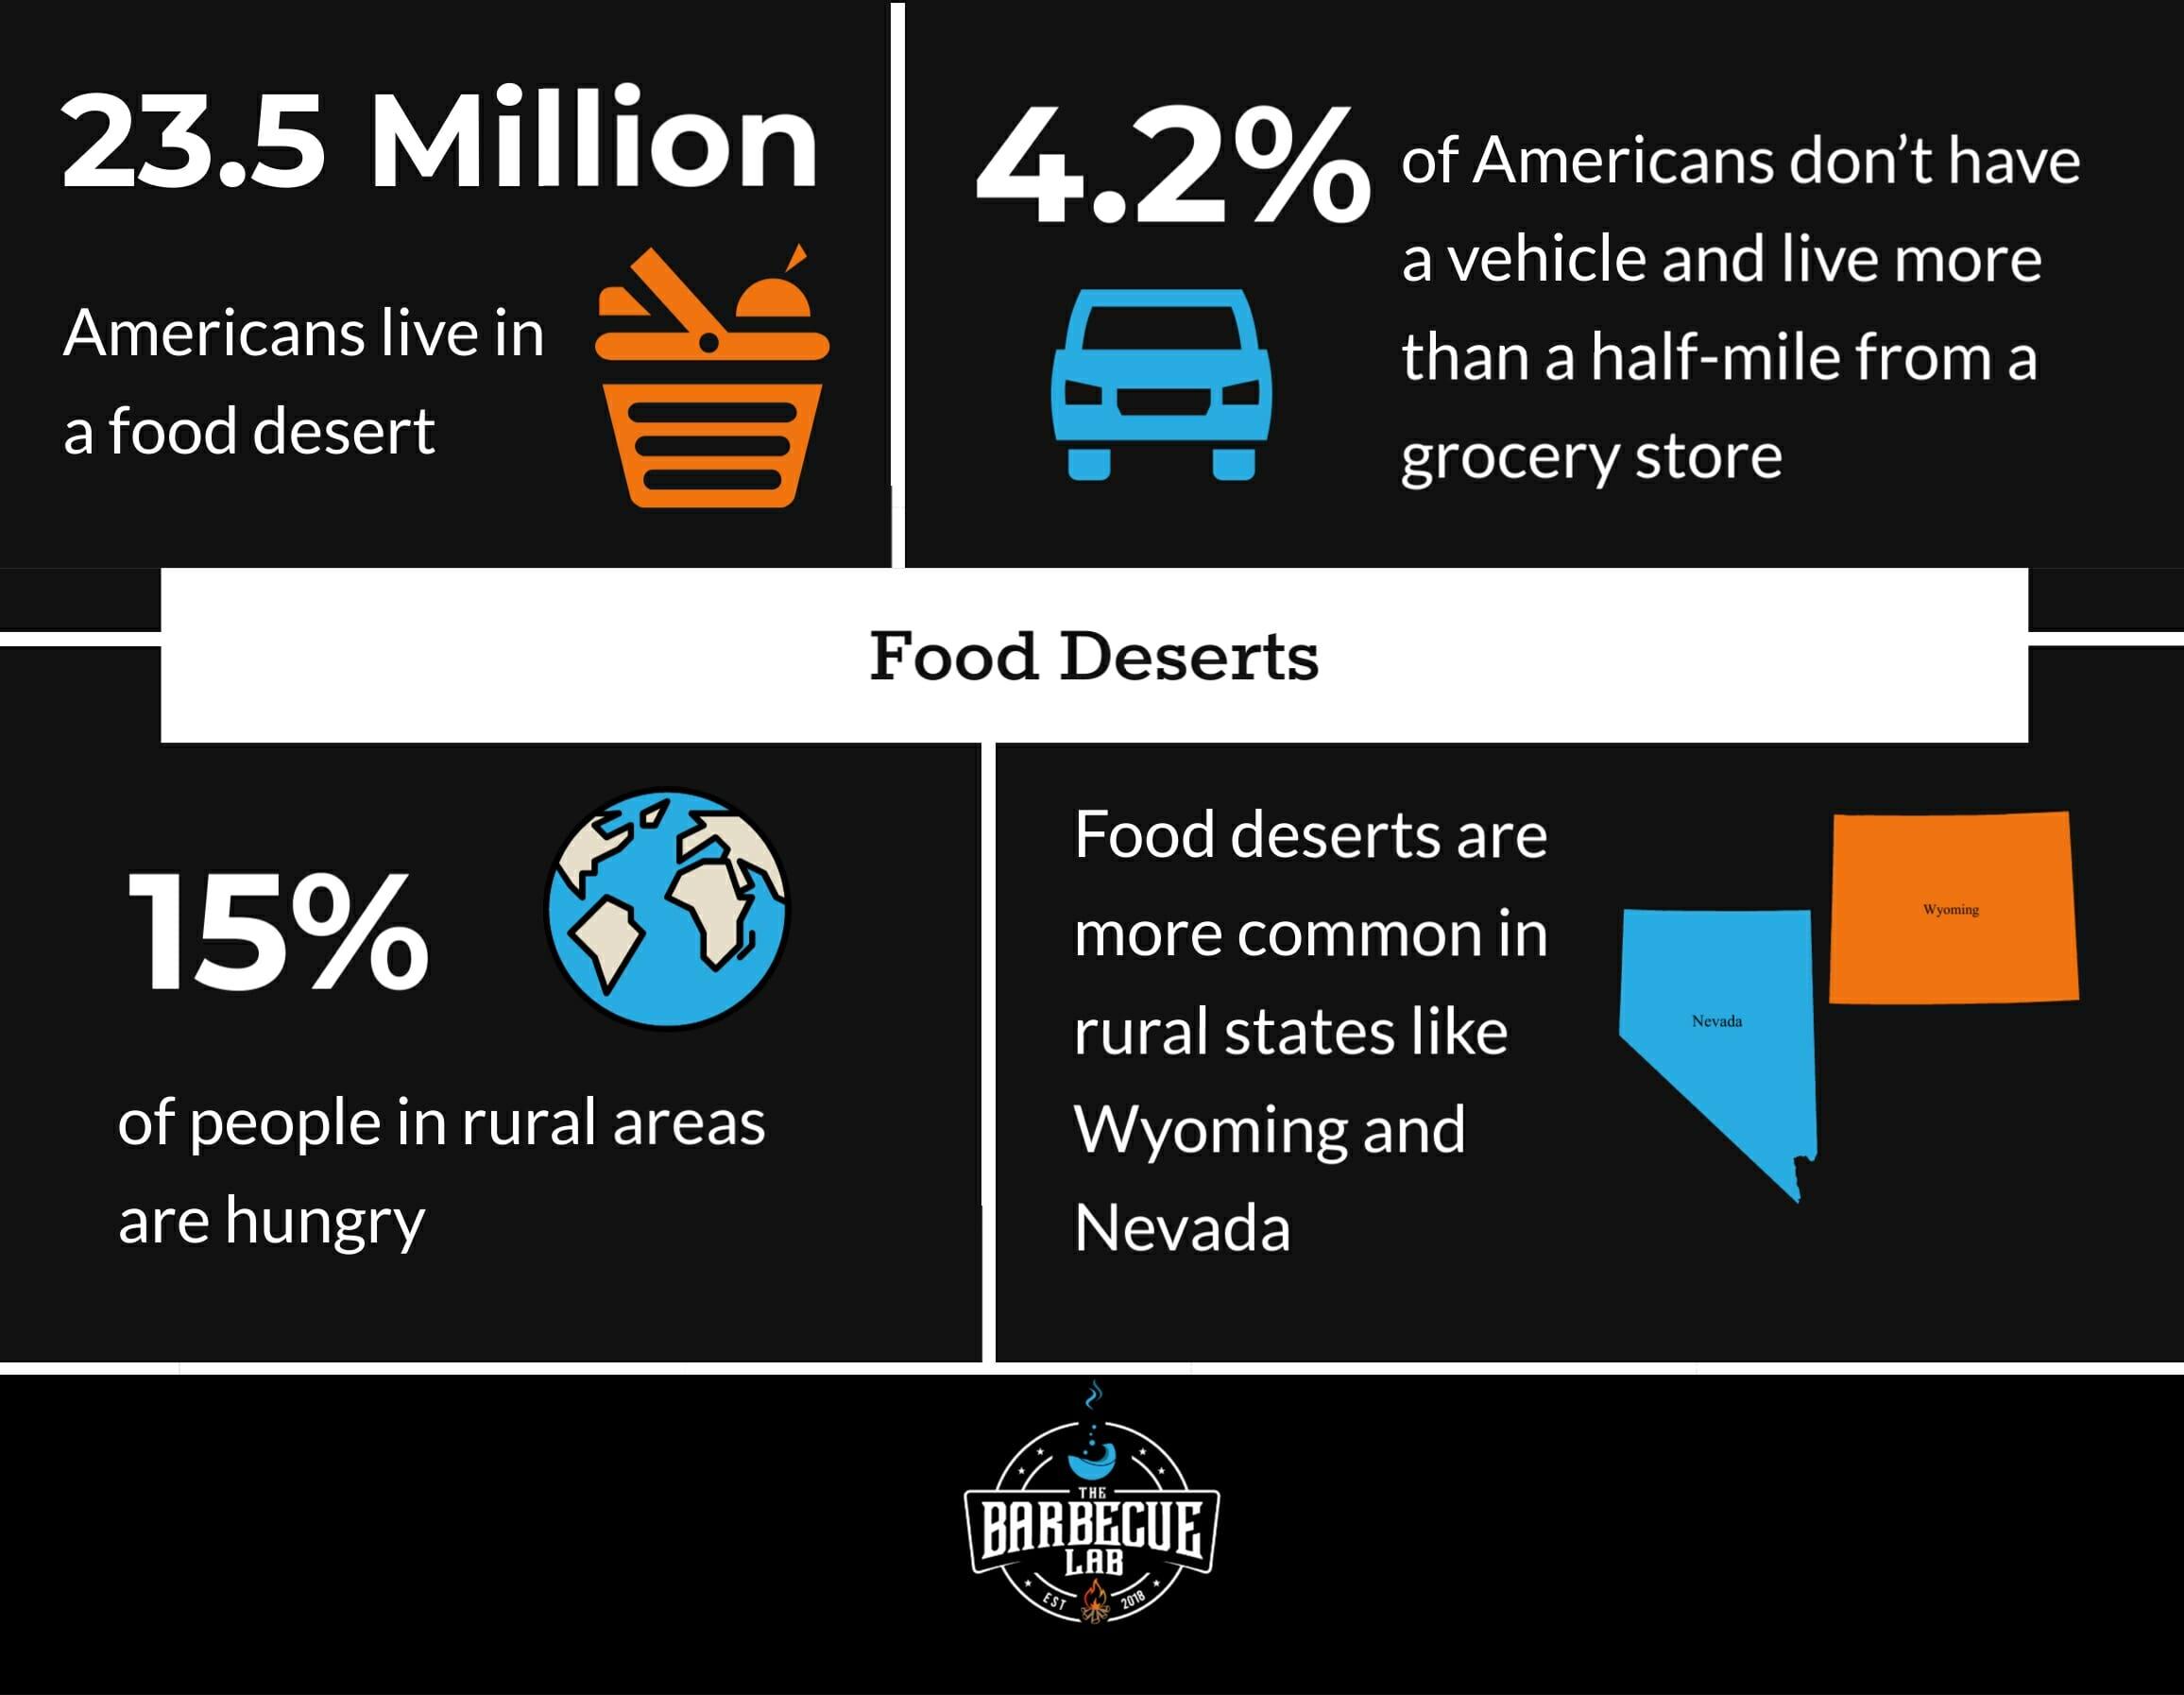 Statistics about food deserts